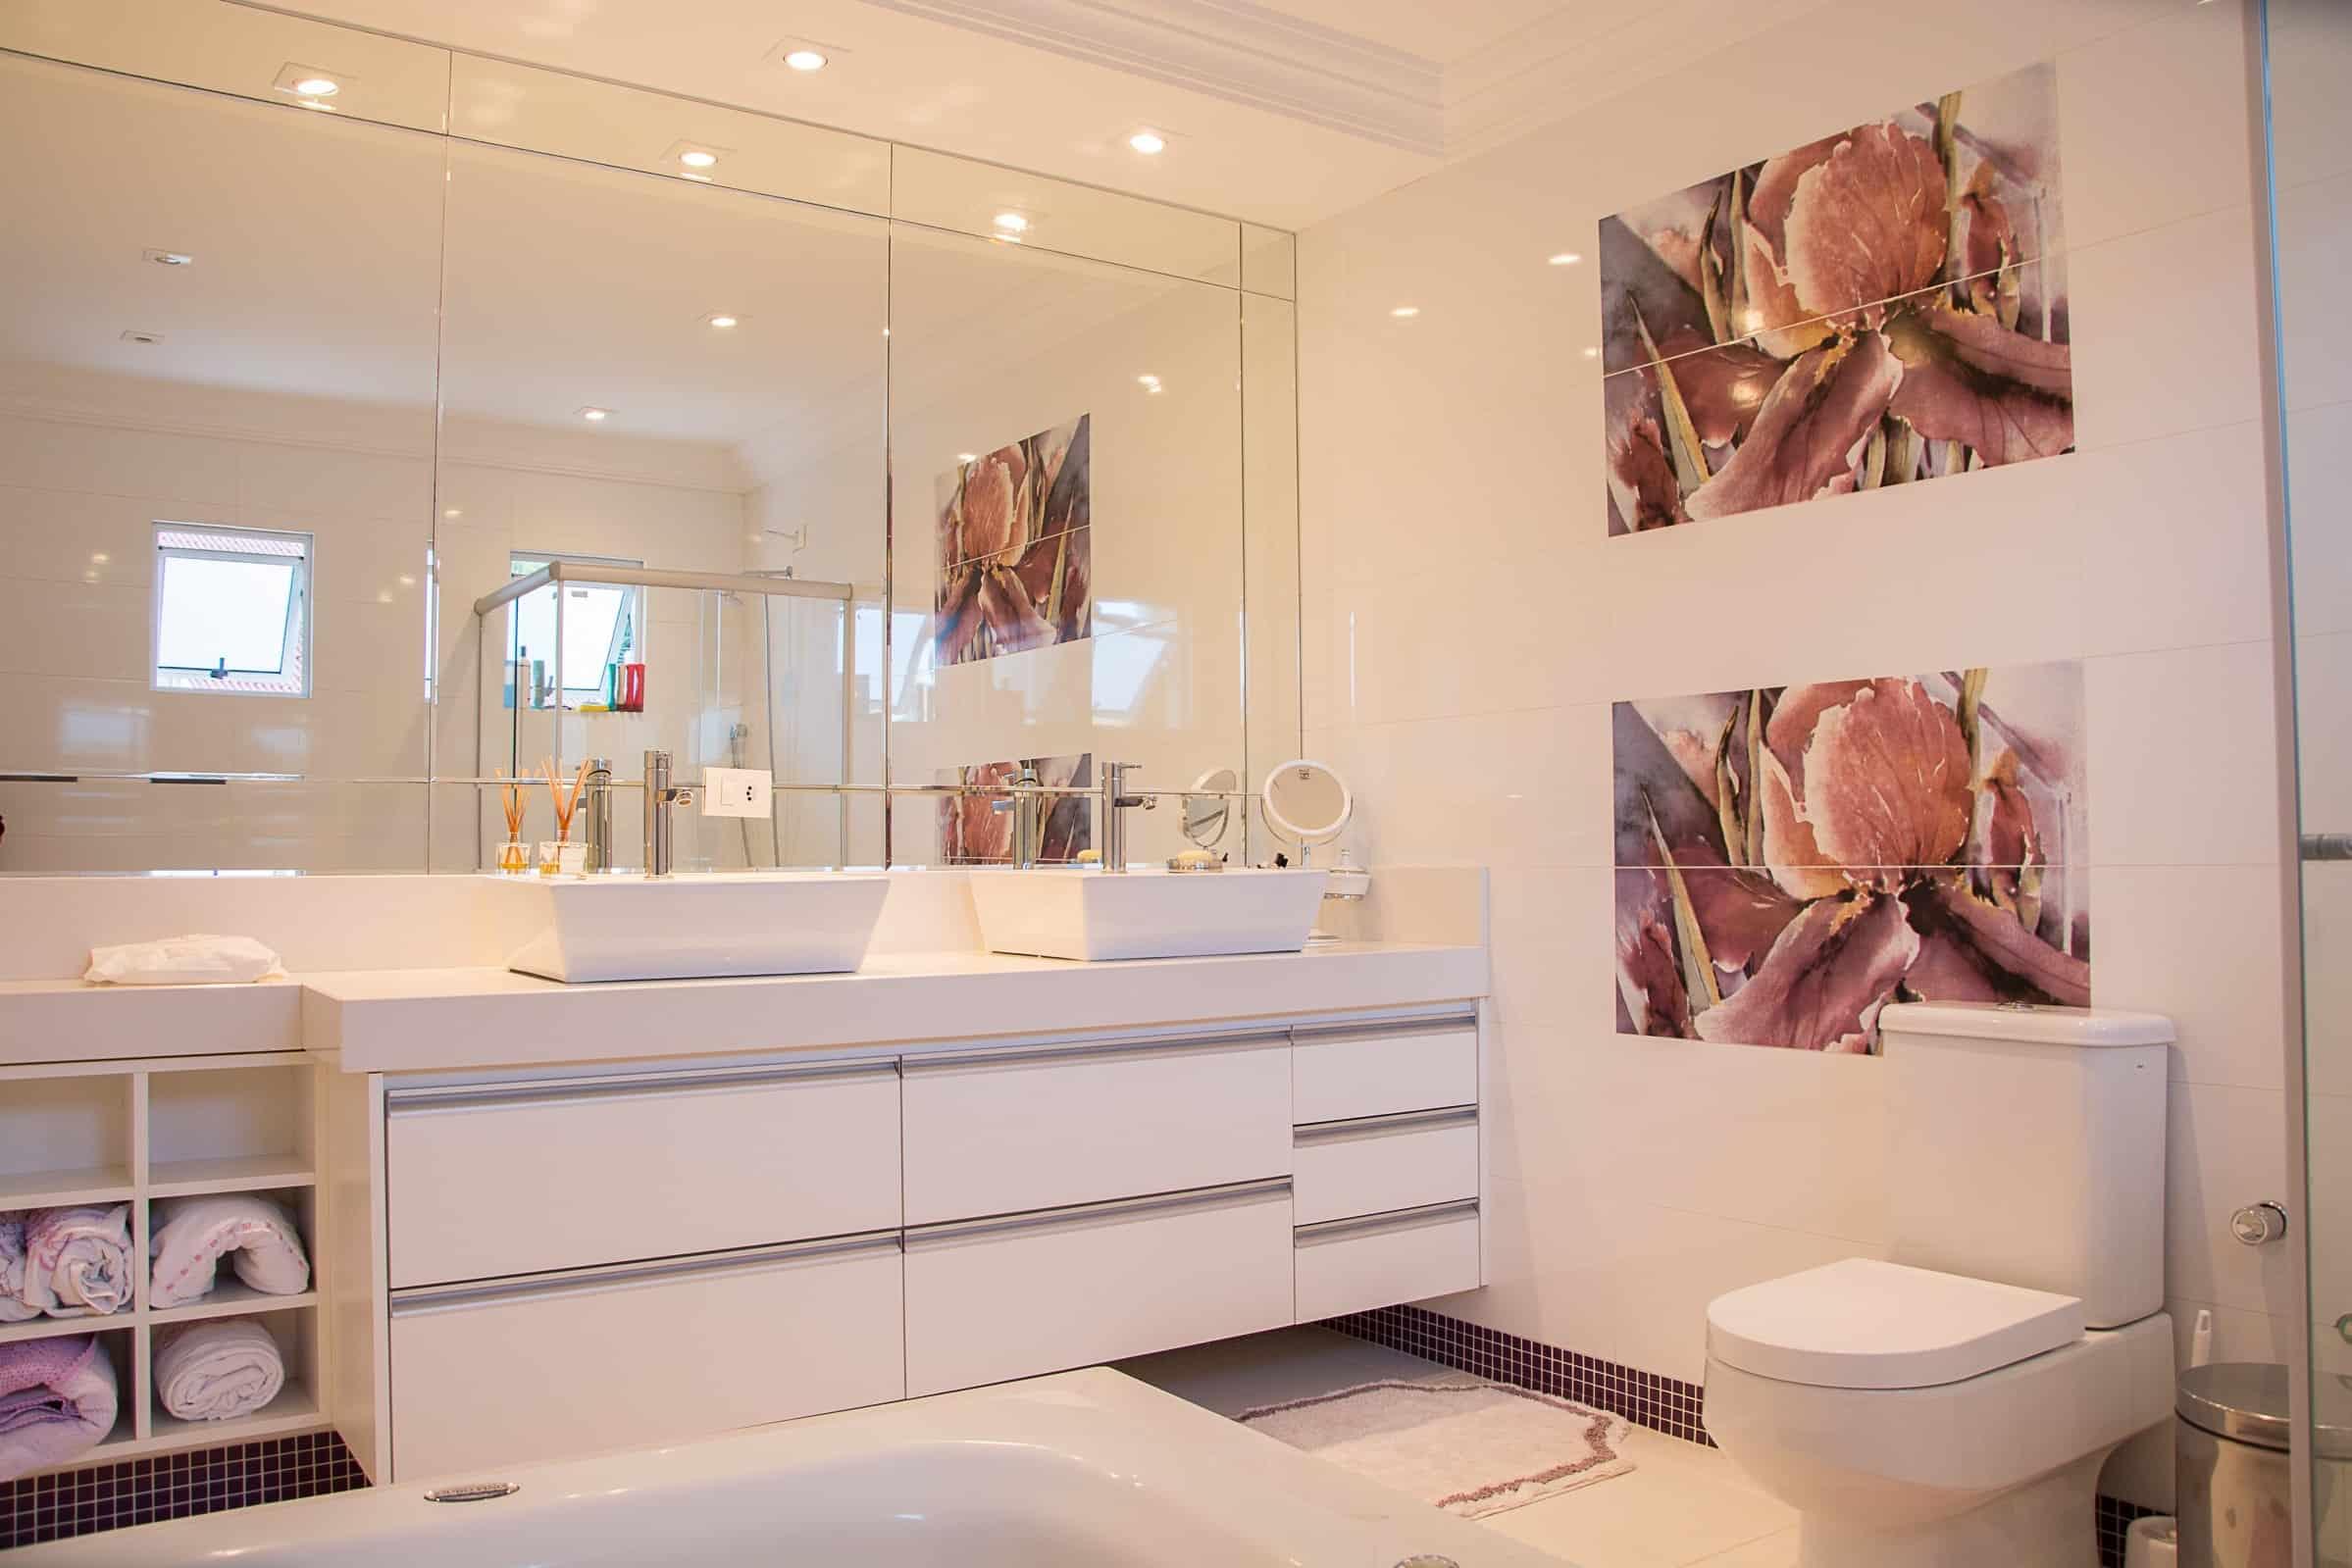 Baie spatioasa, cu mobilier alb, oglinda mare montata direct pe perete, si tablouri cu flori in tonuri de roz